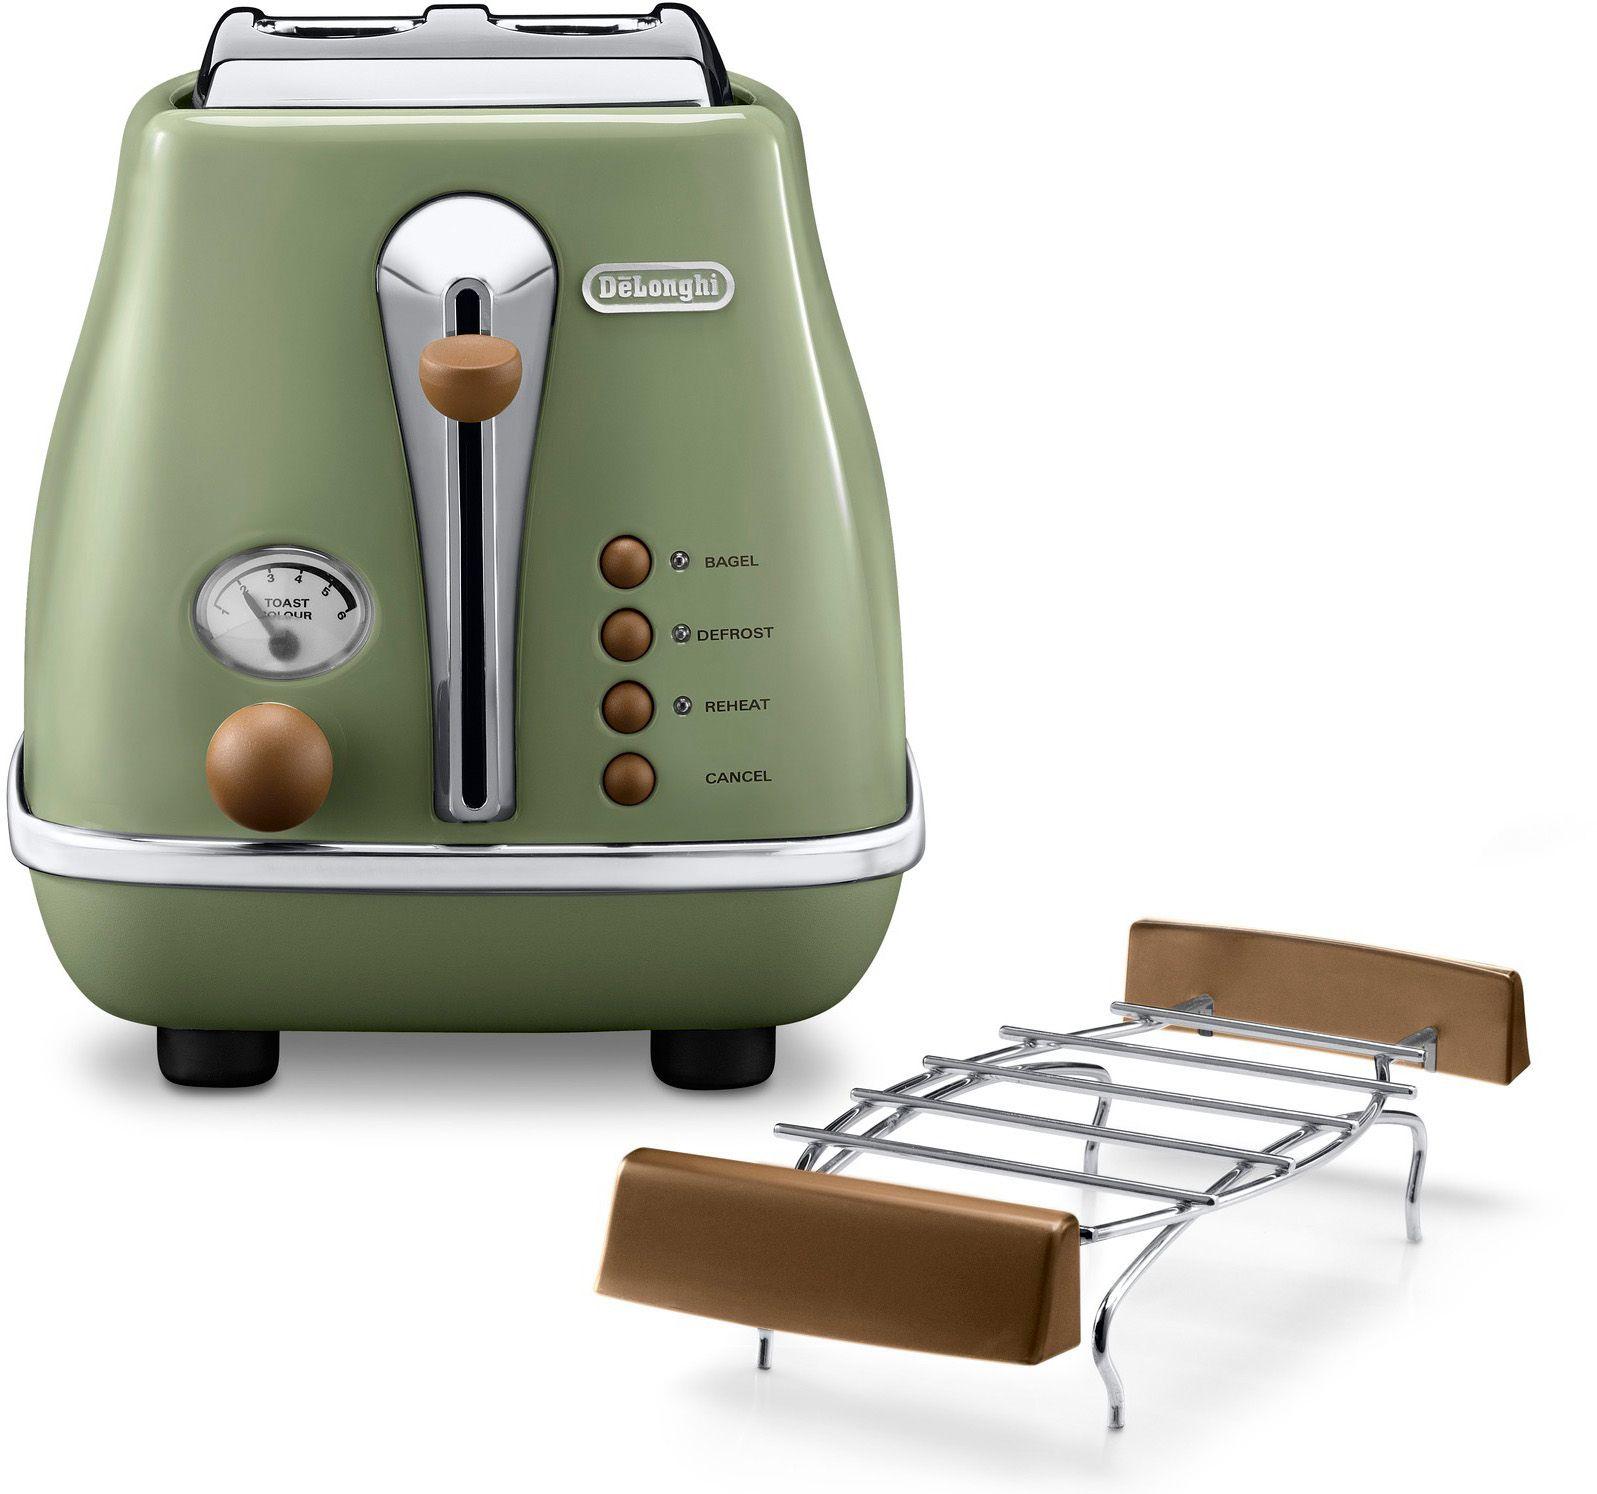 DELONGHI De'Longhi Toaster Icona Vintage »CTOV 2103.GR«, im Retro-Look, mit Brötchenaufsatz, 900 Watt